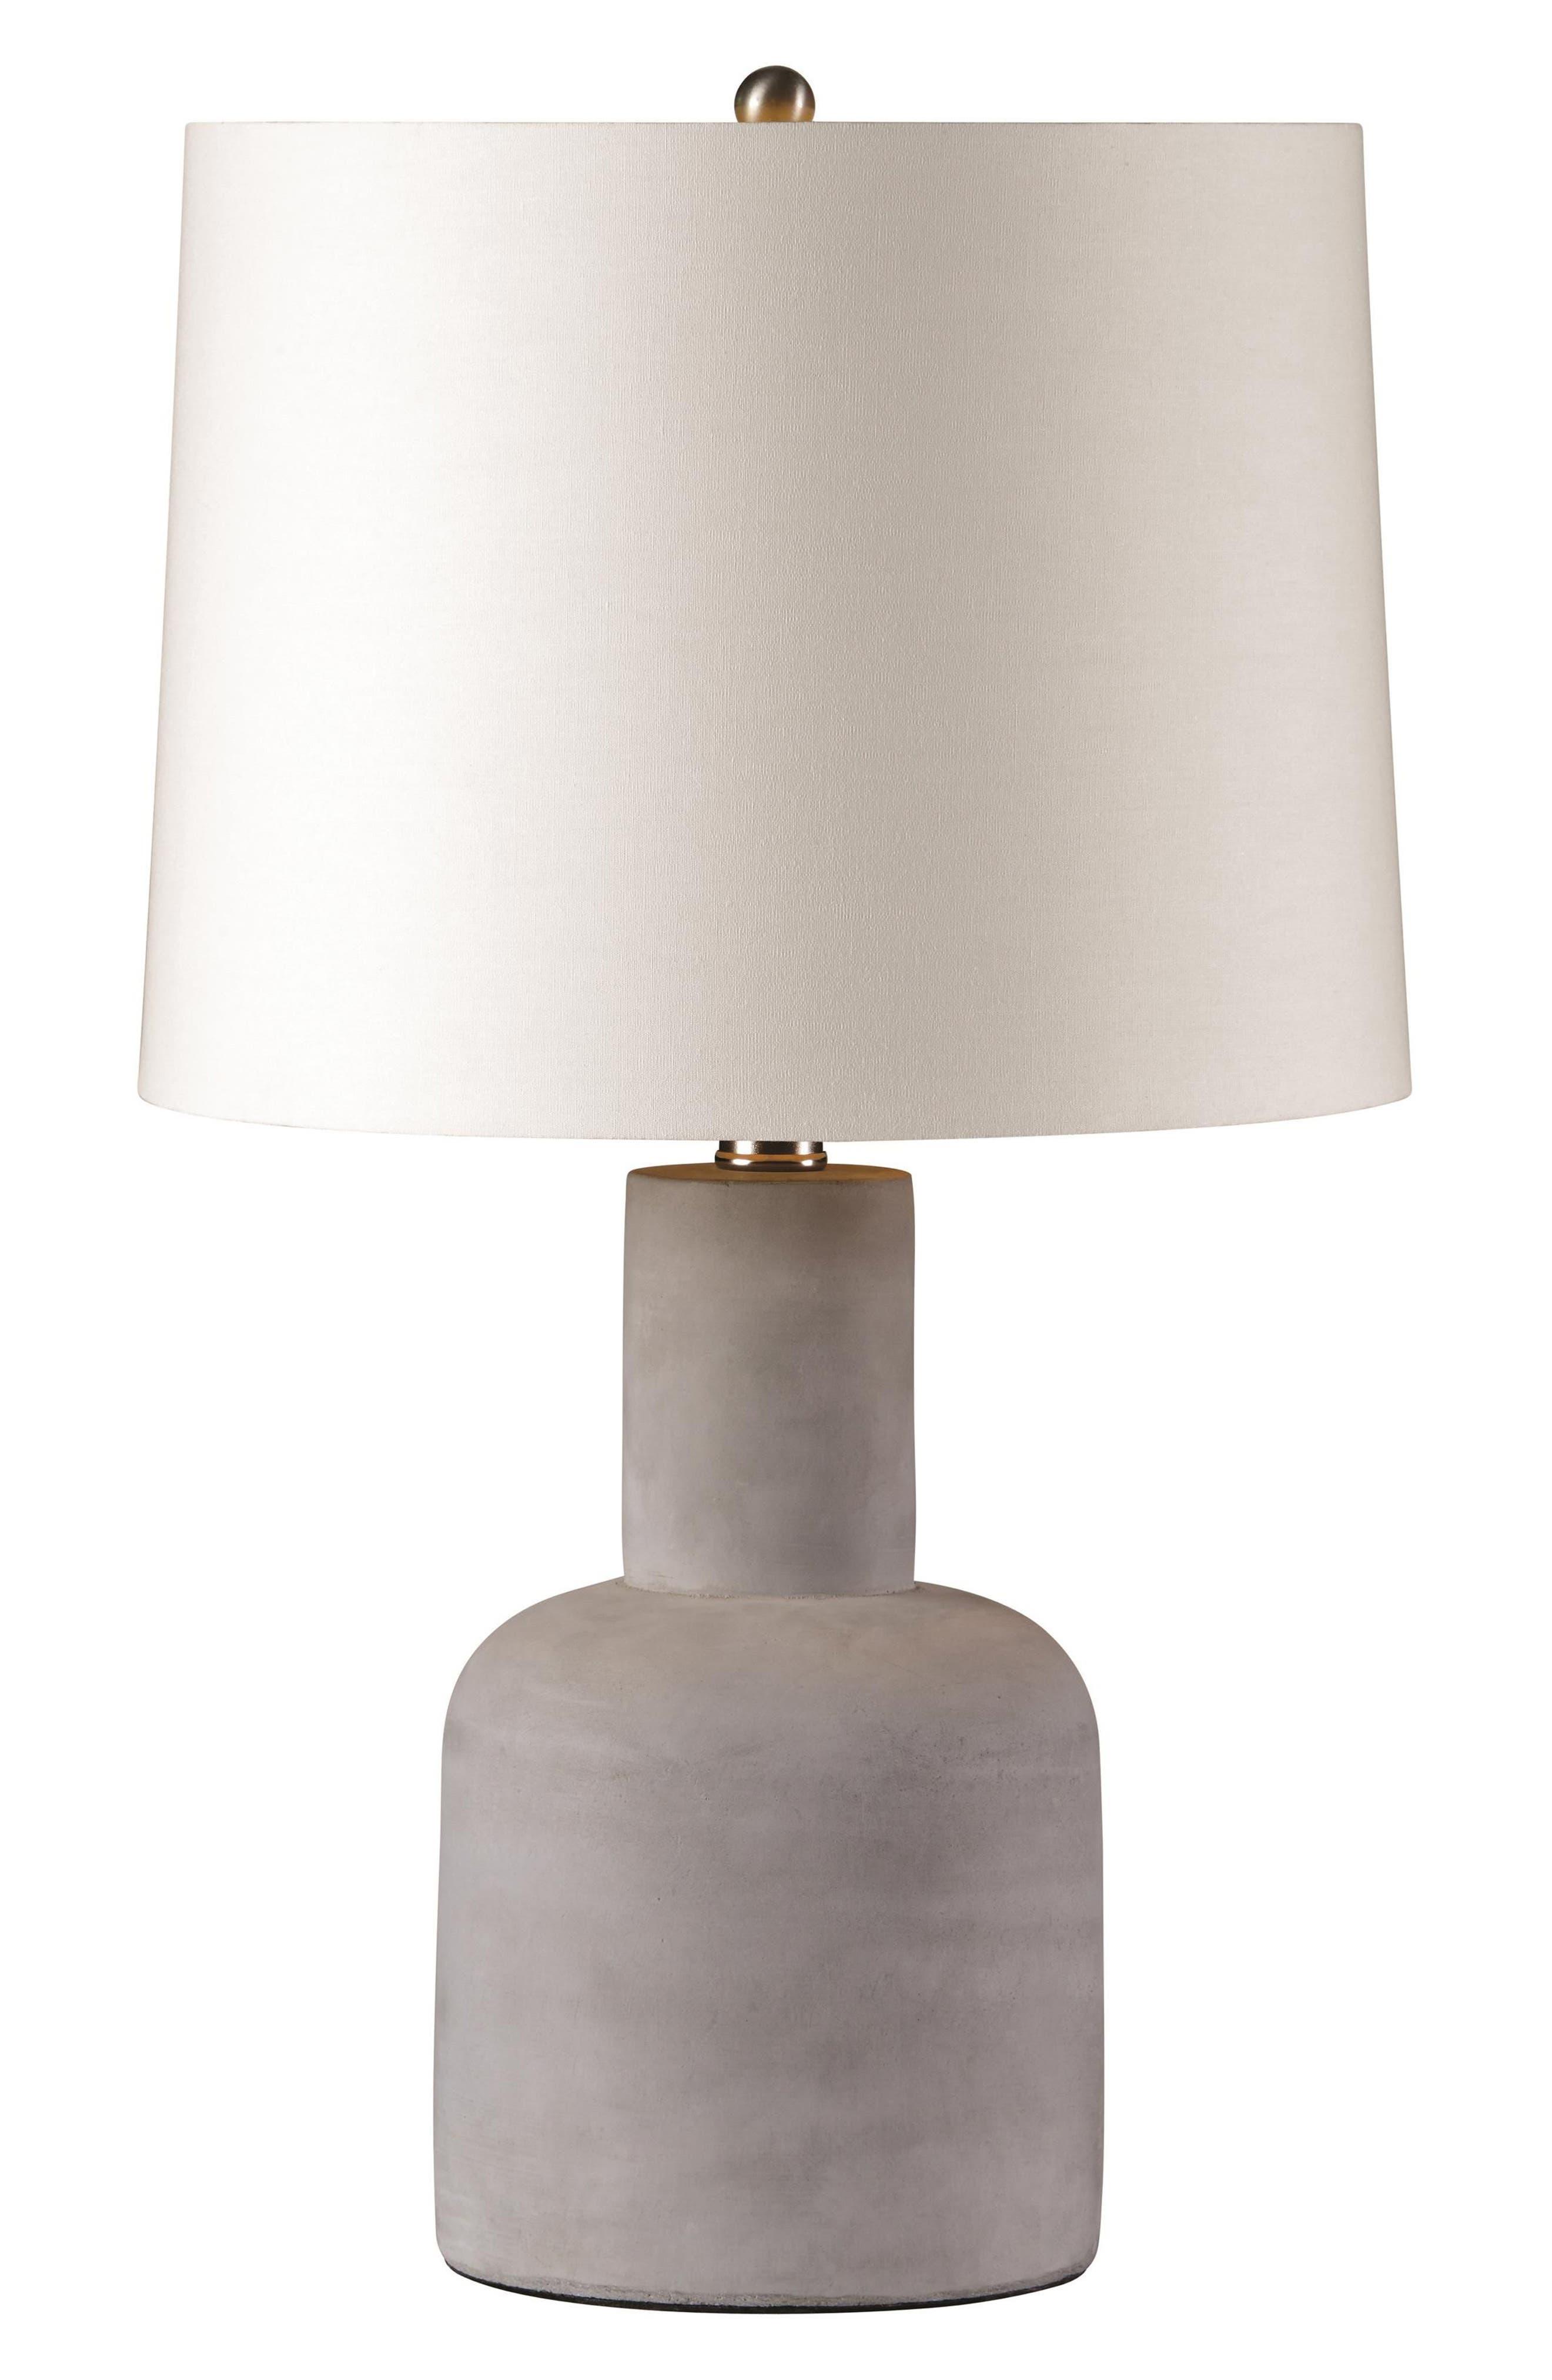 Dansk Table Lamp,                             Main thumbnail 1, color,                             020